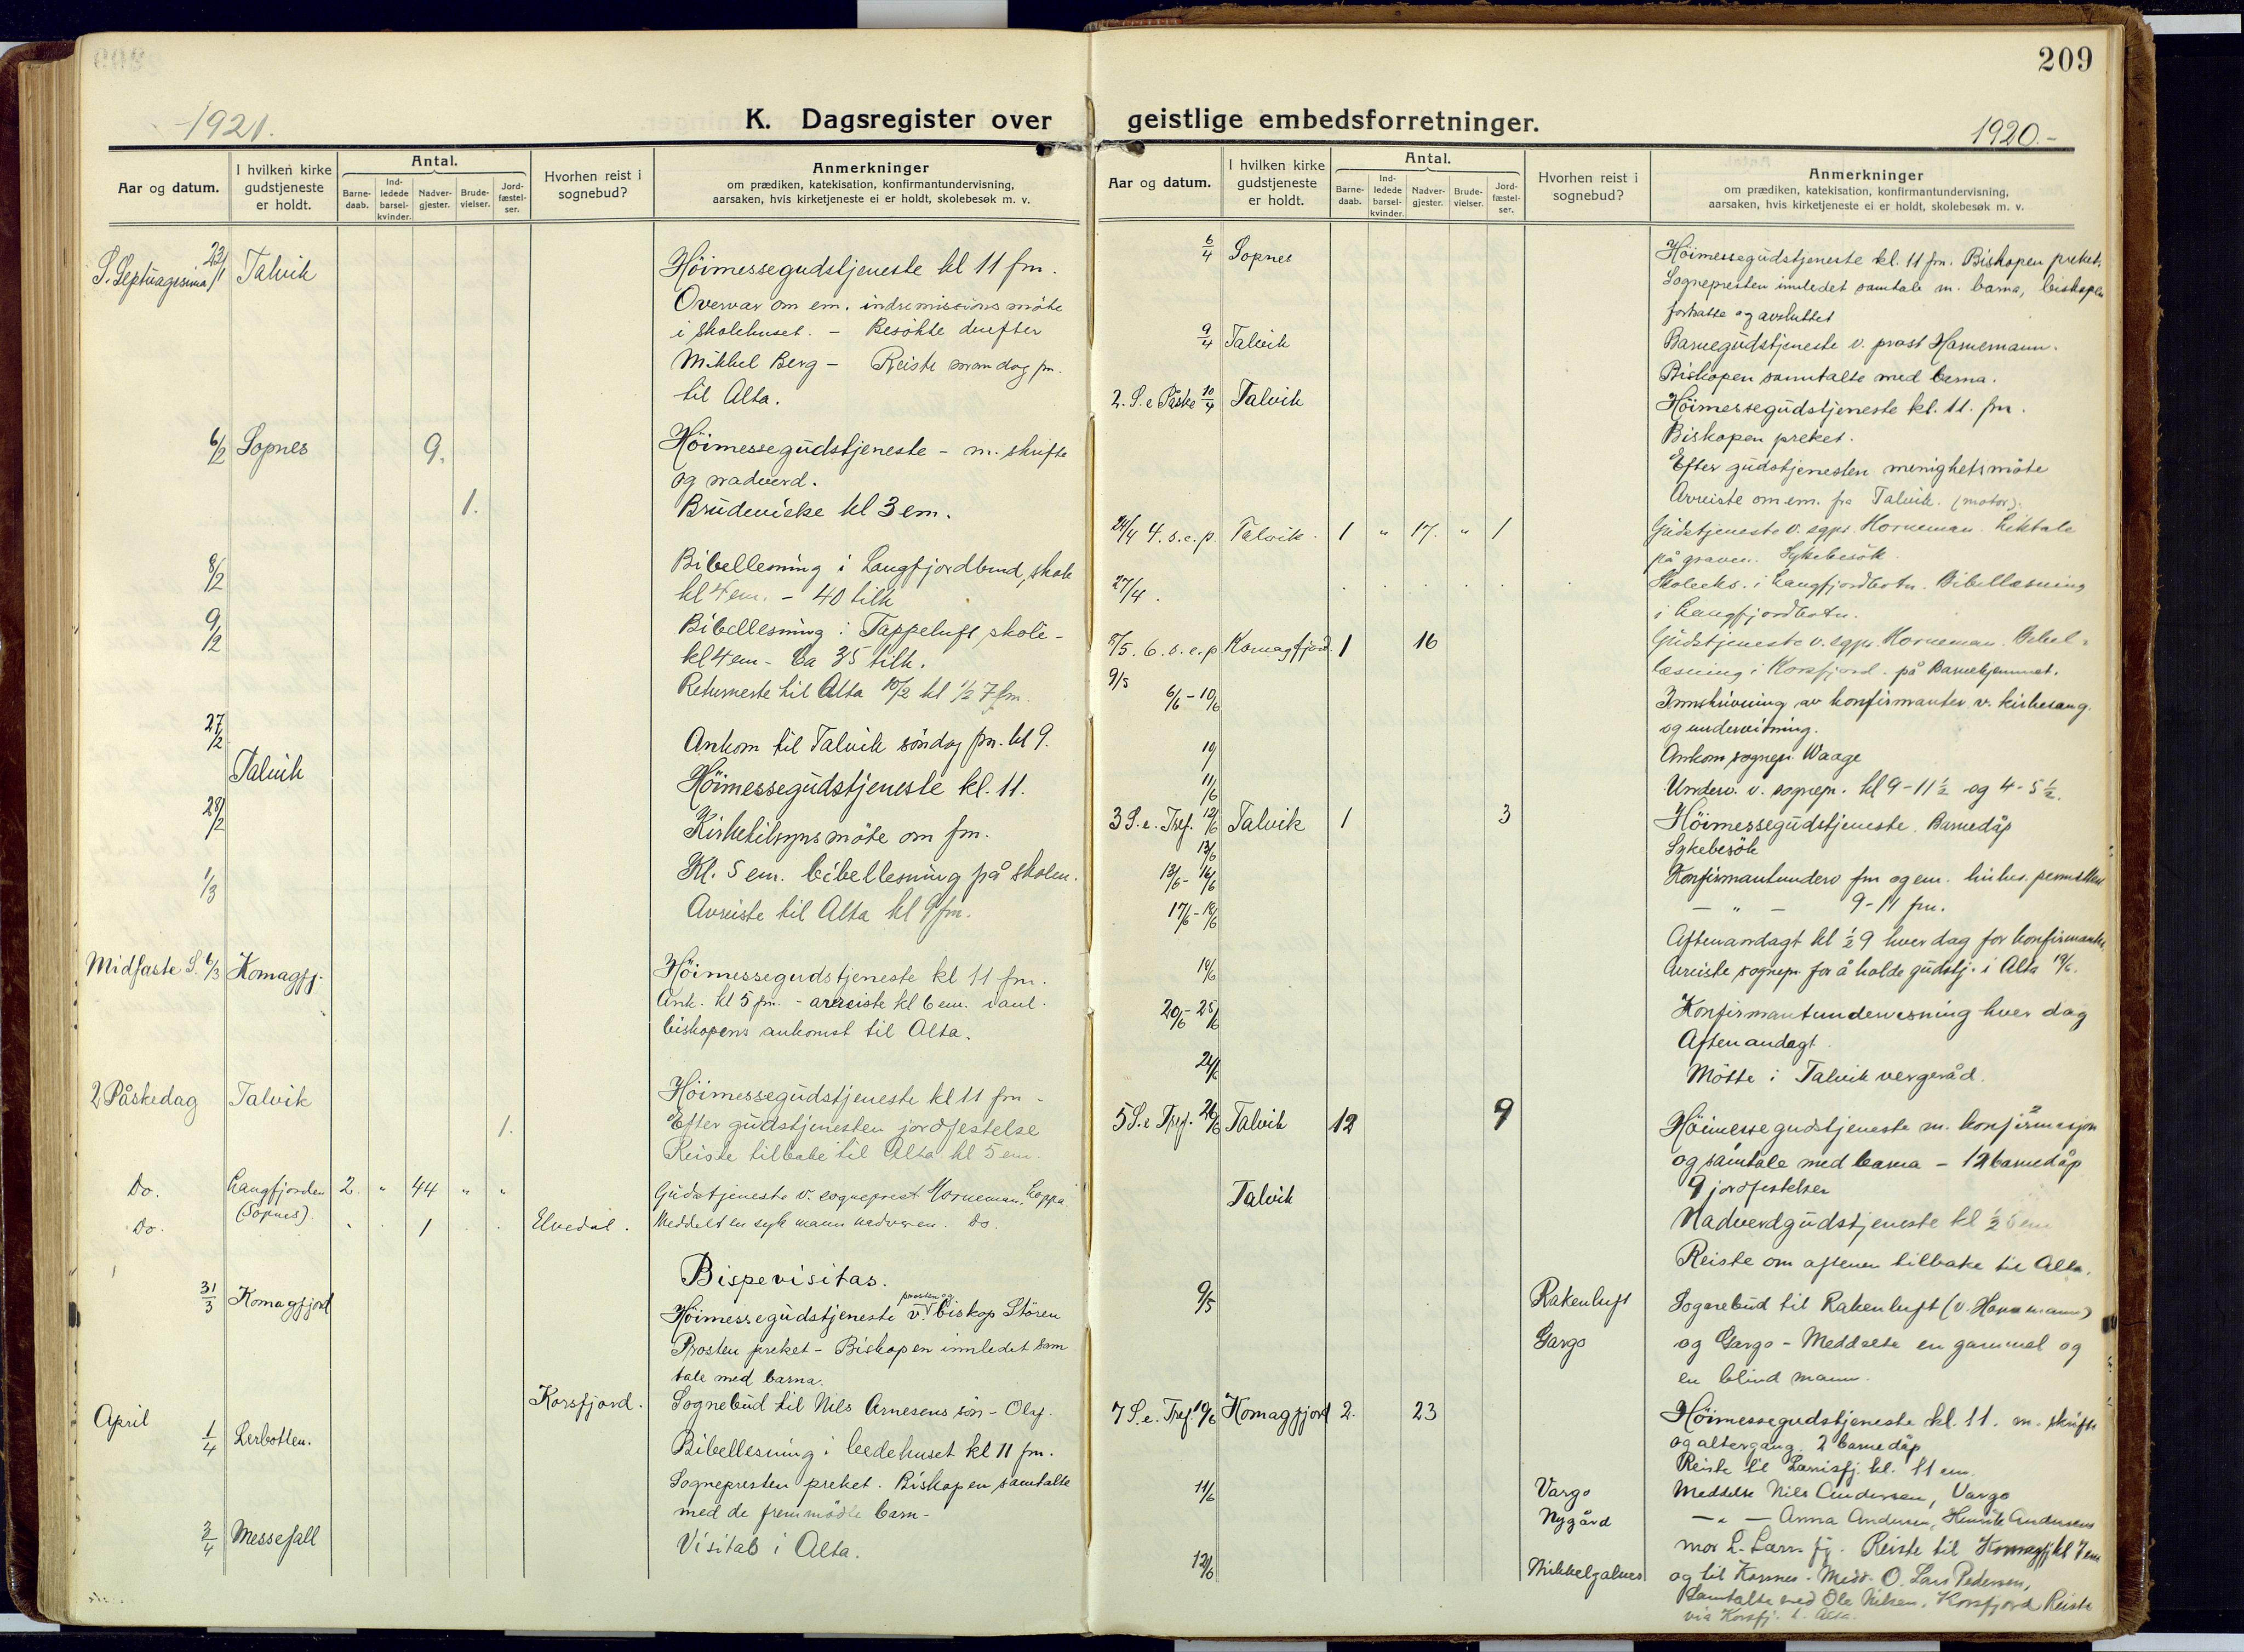 SATØ, Talvik sokneprestkontor, H/Ha/L0018kirke: Ministerialbok nr. 18, 1915-1924, s. 209